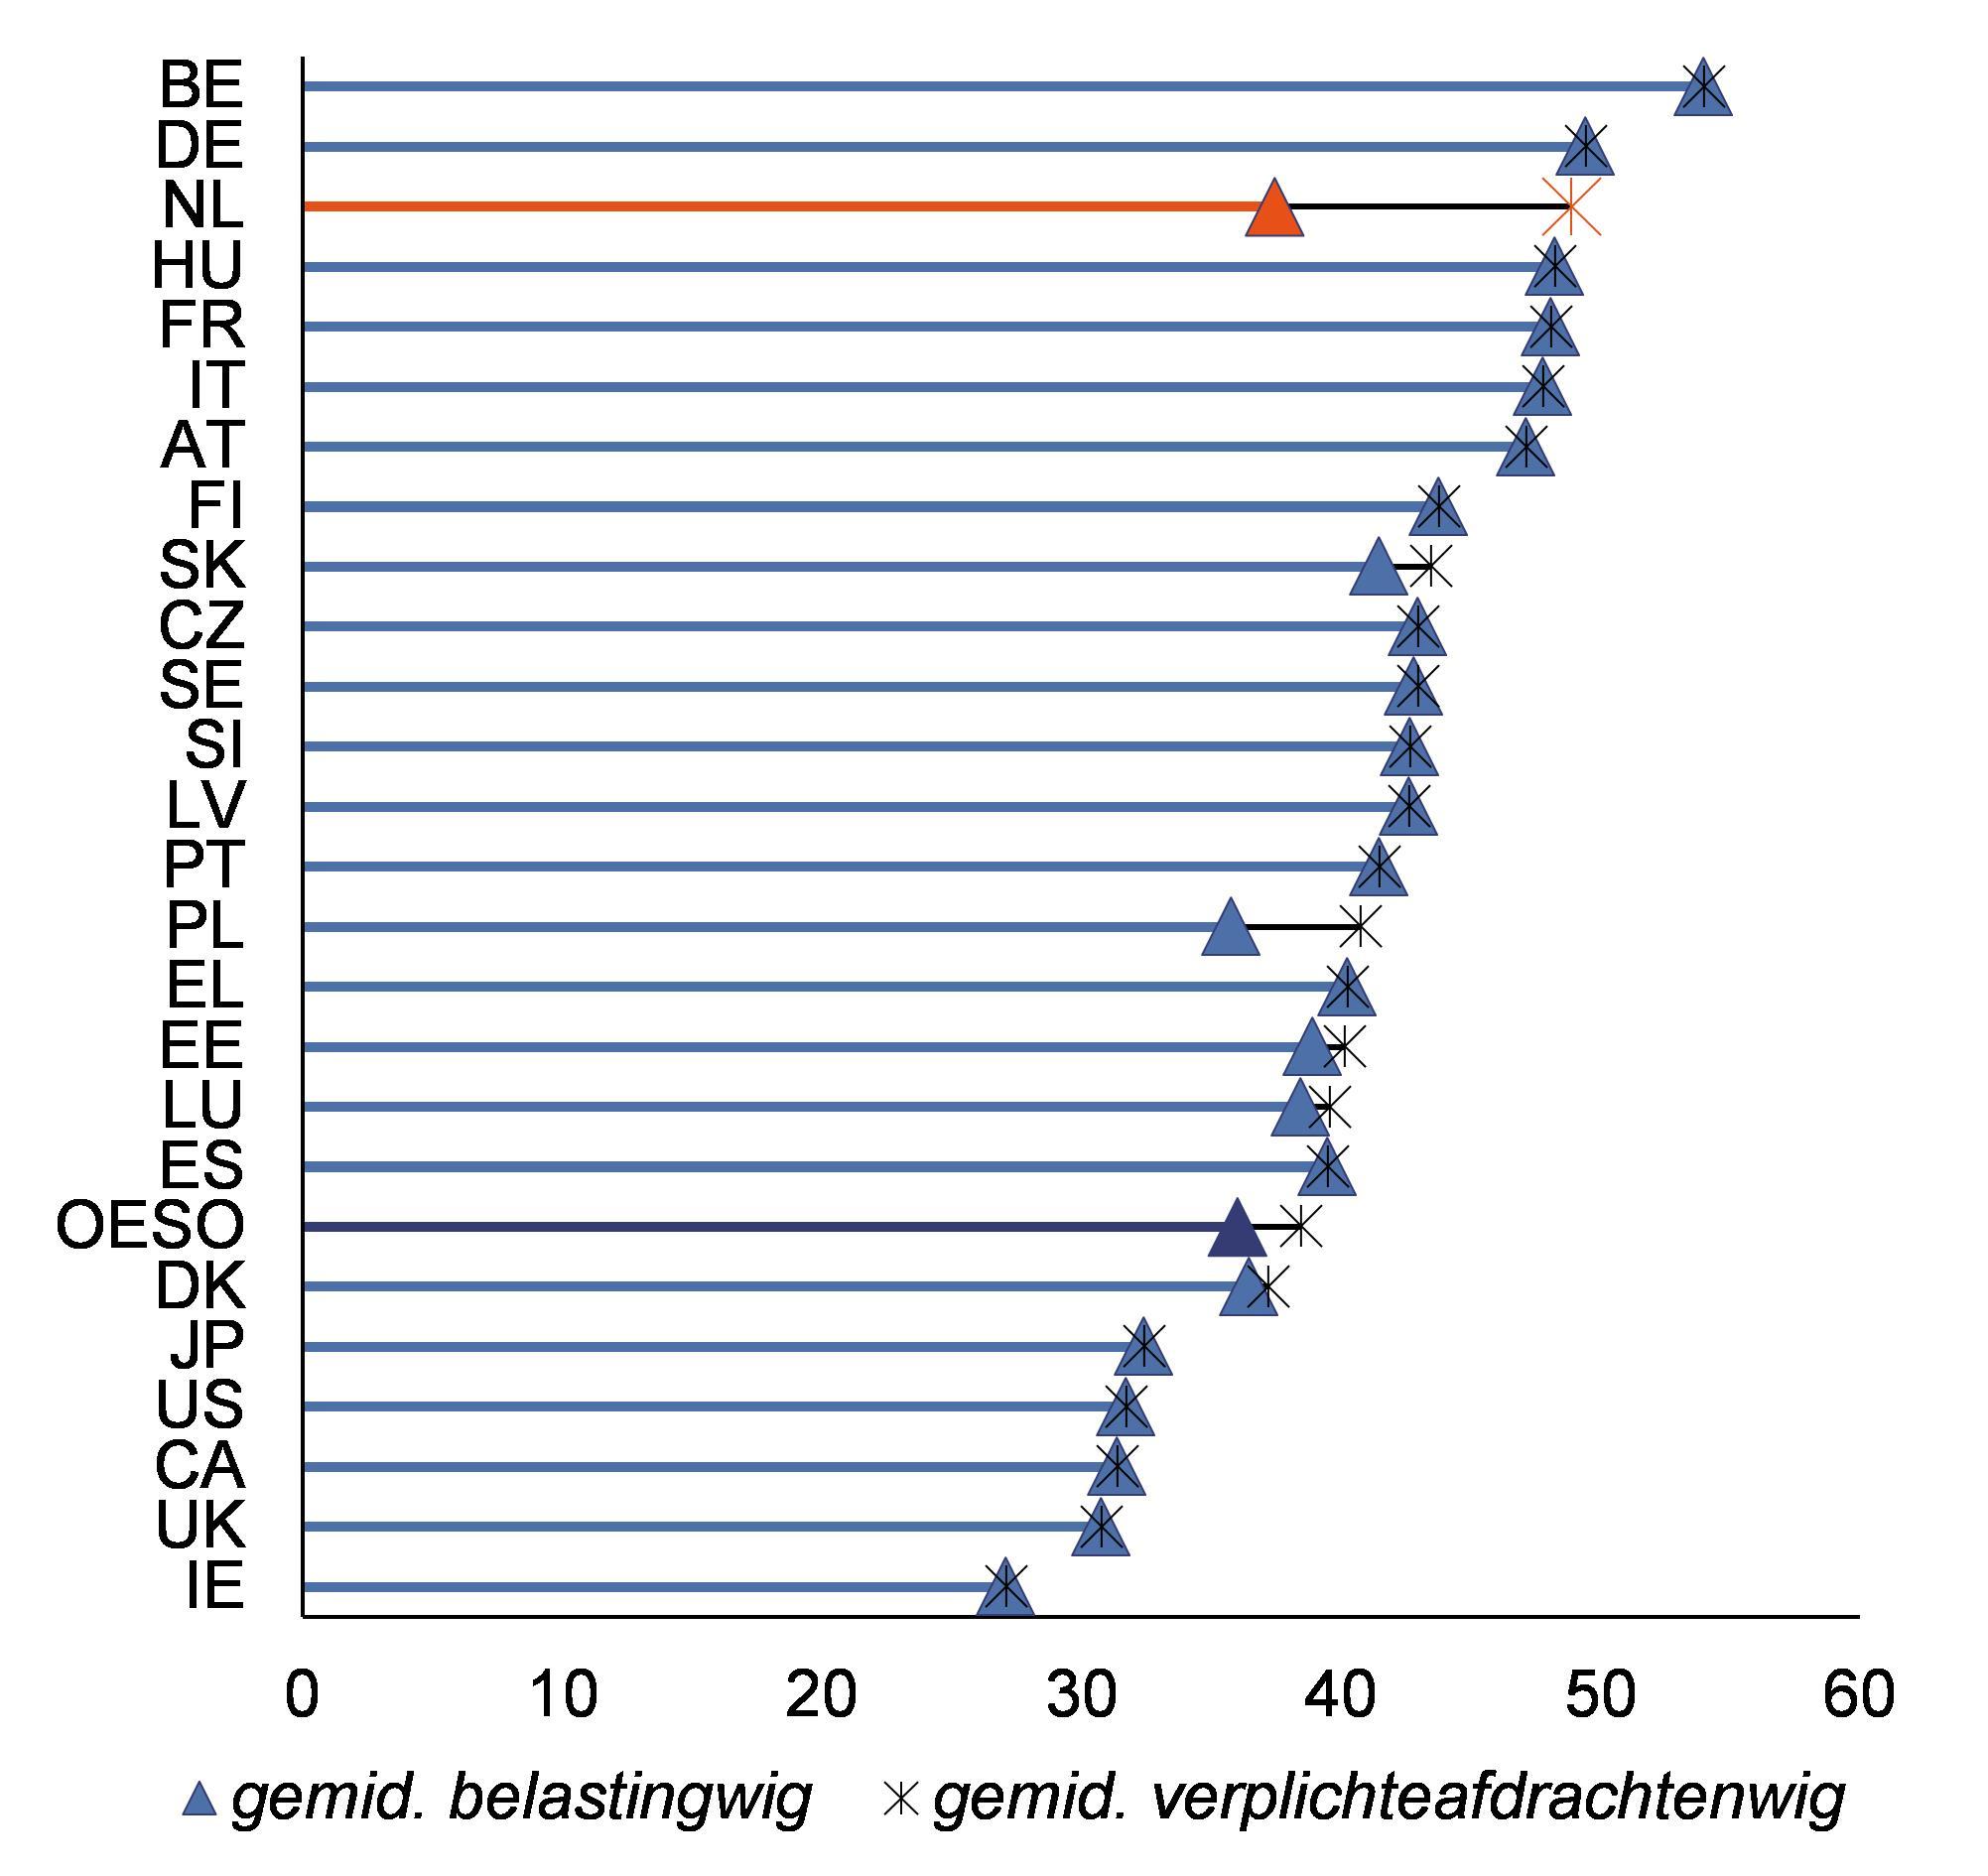 Niet-fiscale verplichte afdrachten als extra lasten op inkomen uit arbeid  in 2016. http://www.oecd.org/tax/tax-policy/Non-tax-compuslory-payments.pdf.